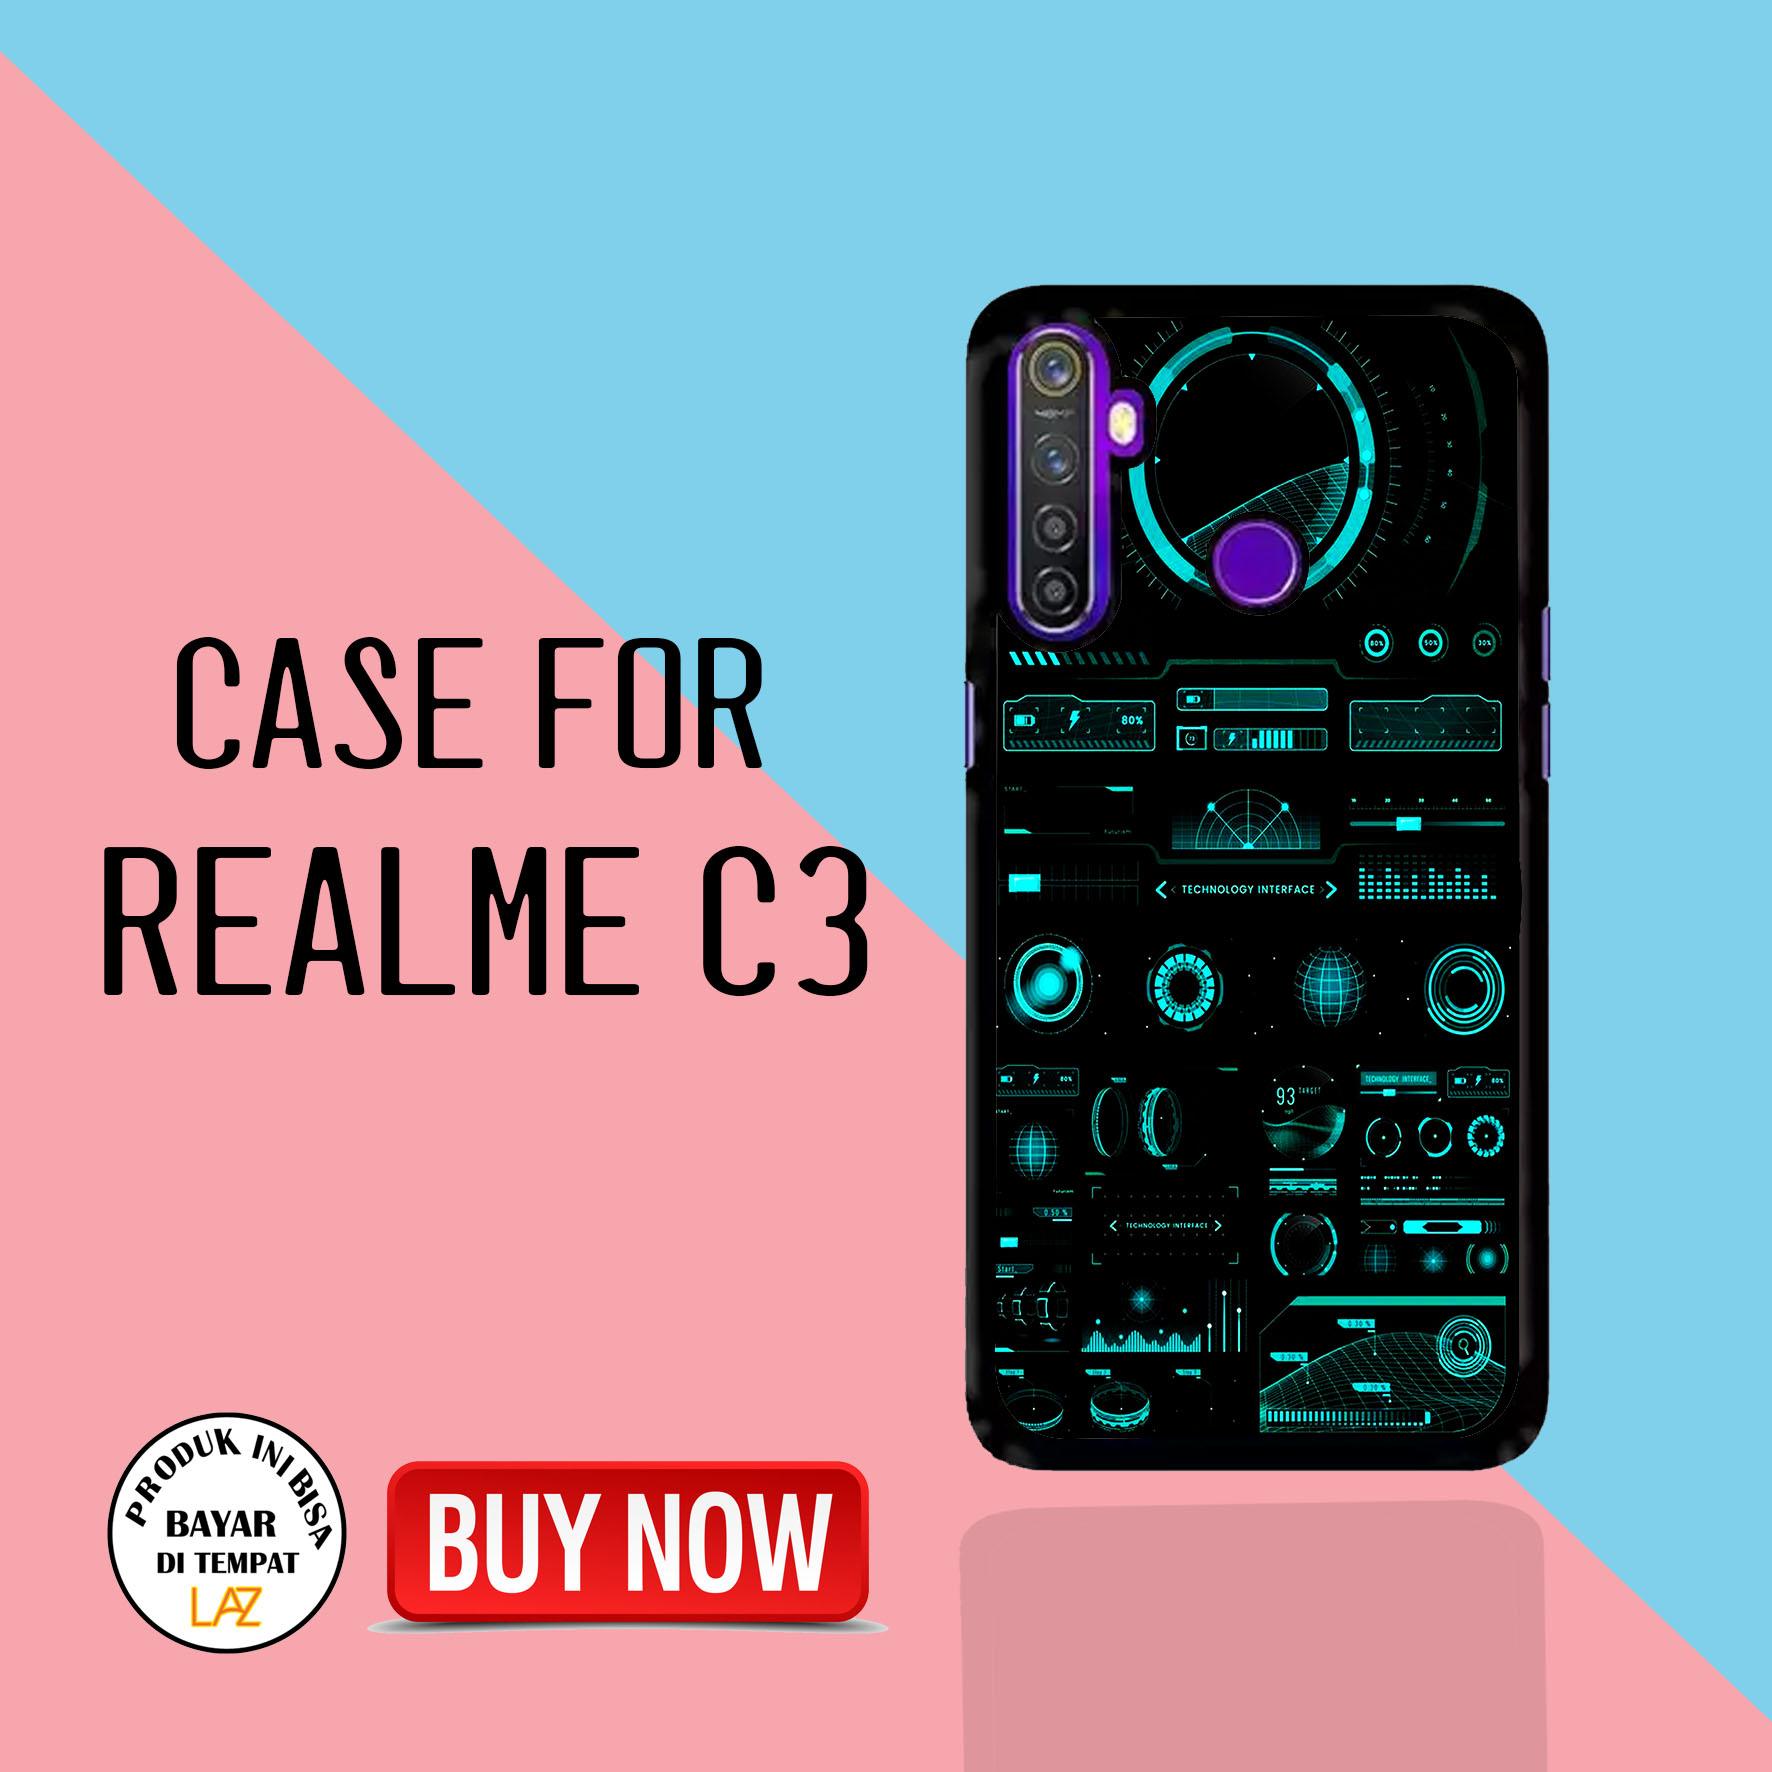 Realme C3 Unicase Fashion Wallpaper Hp 195 A Pelindung Belakang Ponsel Pelindung Hp Case Hp Kondom Hp Cassing Hp Hardcase Softcase Lazada Indonesia